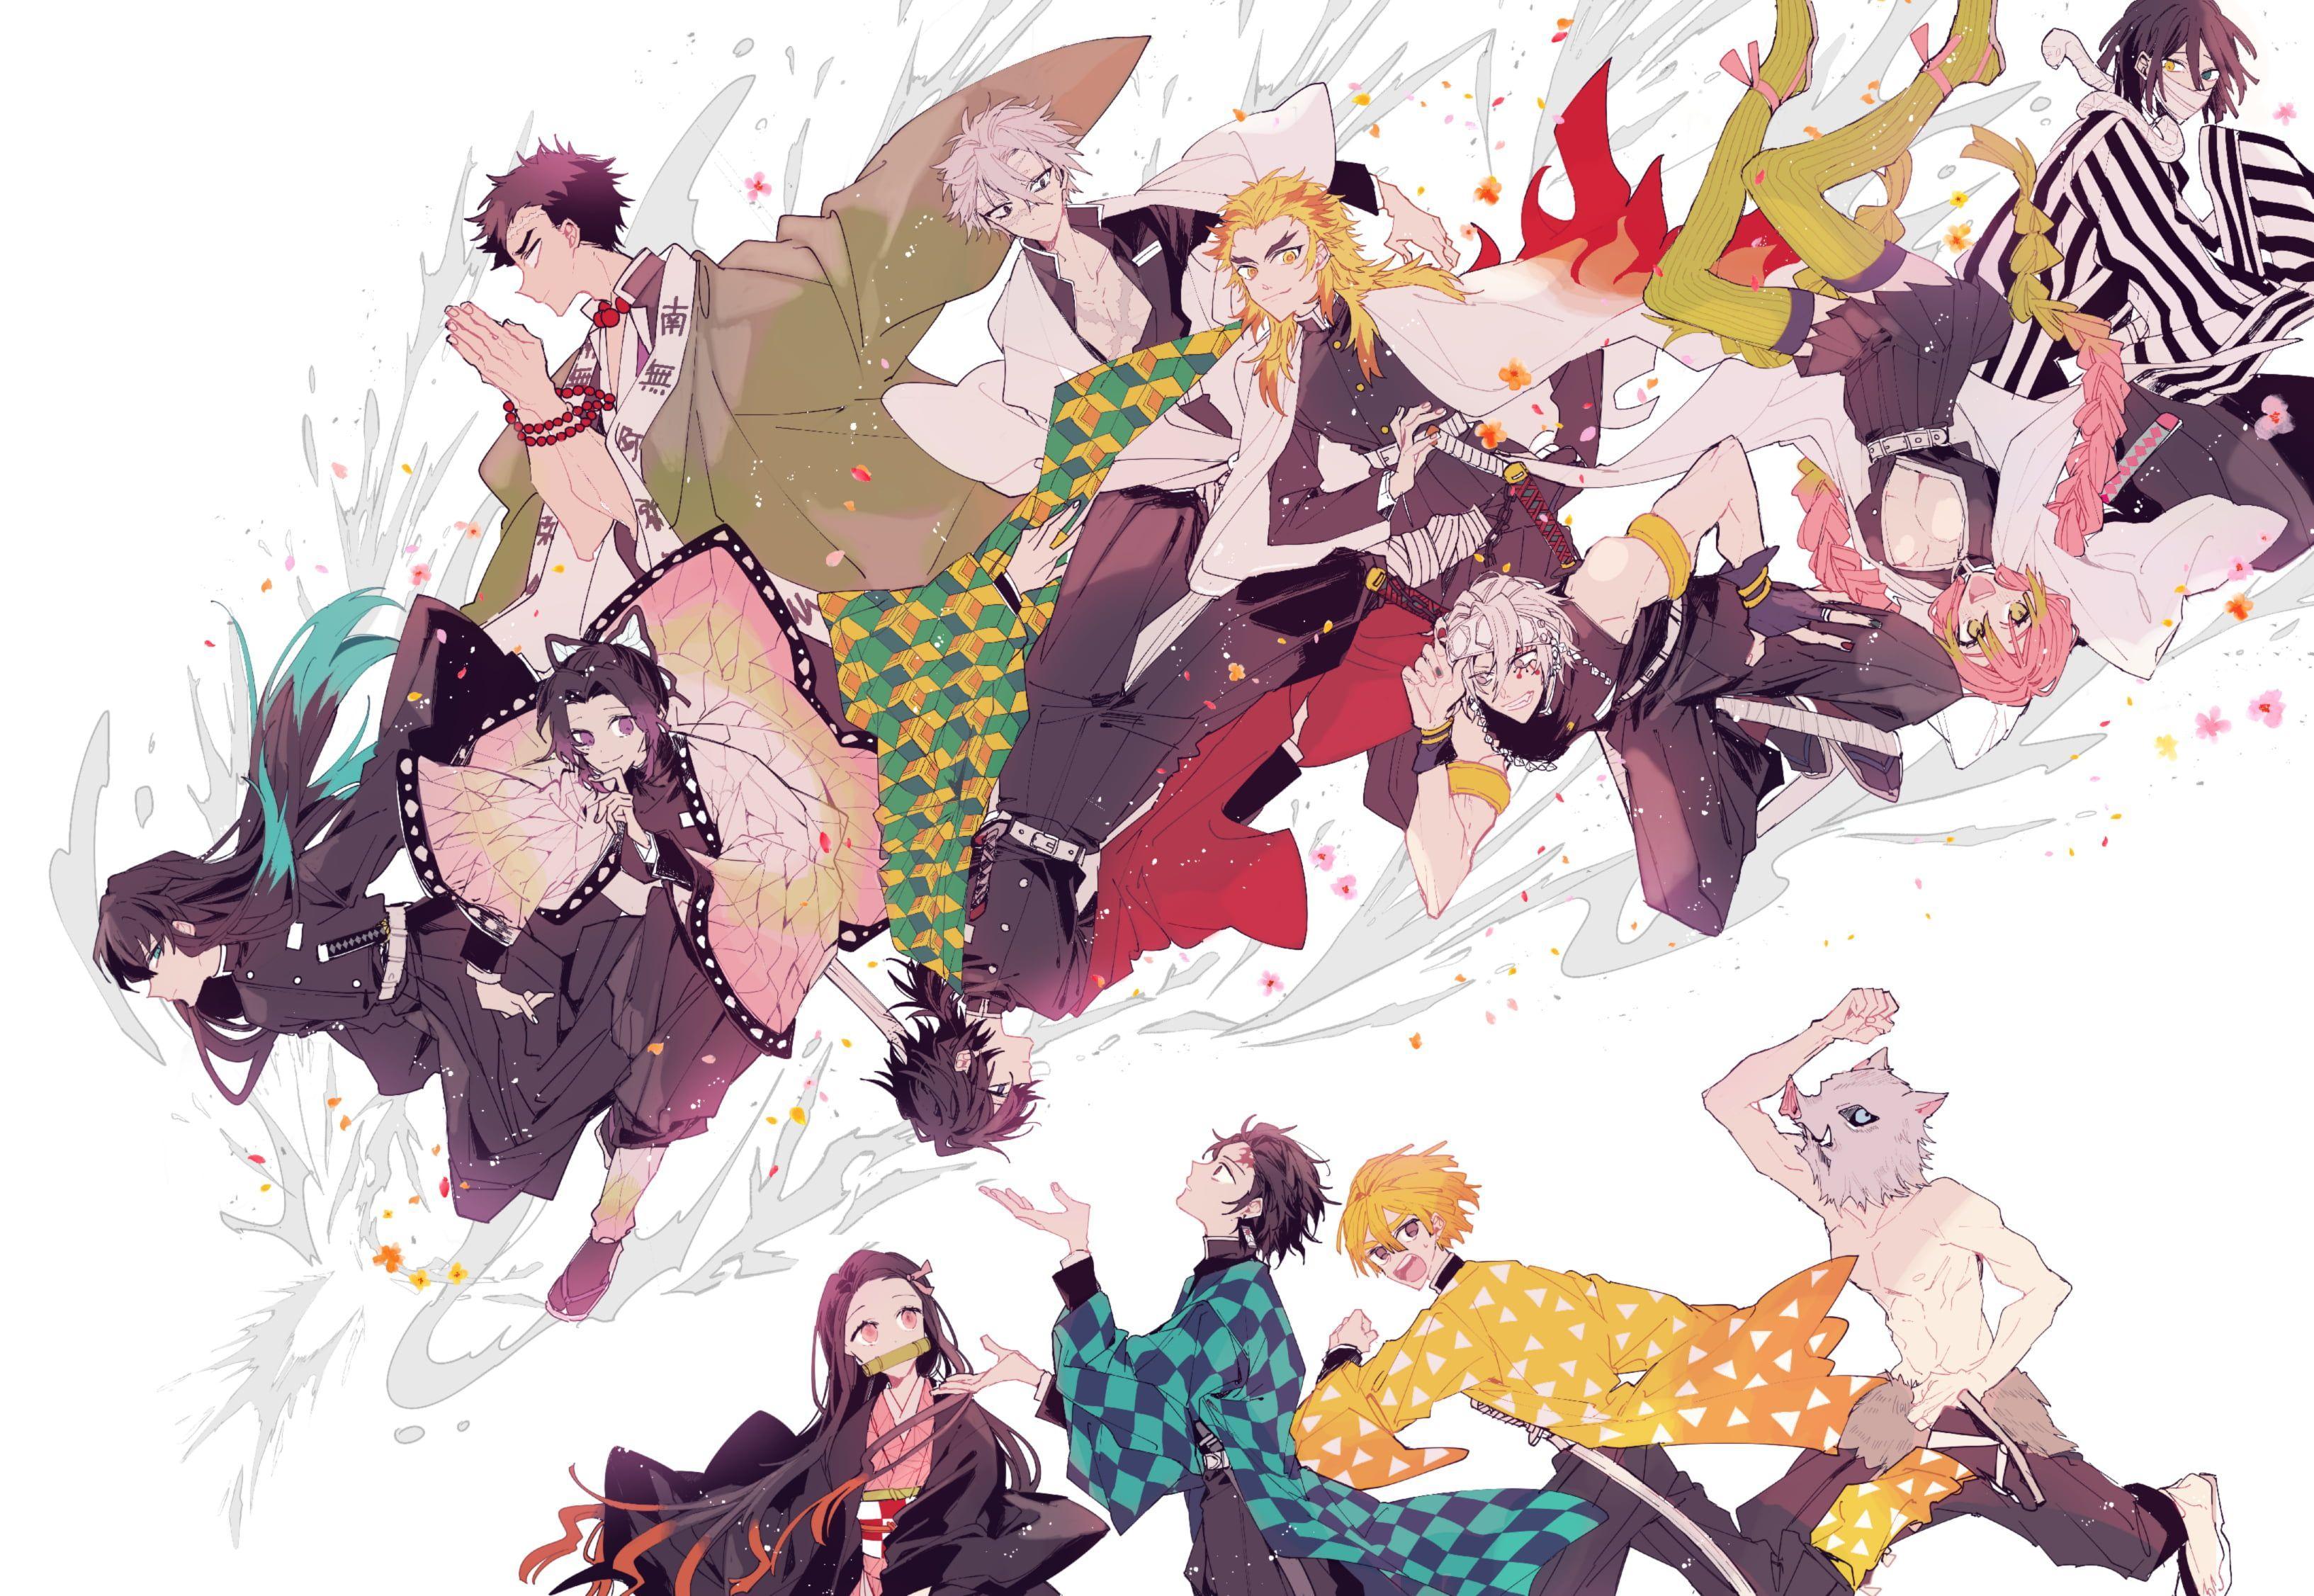 Flame, hashira, wallpapers, wallpaper, caveflame, hashira wallpaper hd. Demon Slayer Hashira Desktop Wallpaper Hd - doraemon